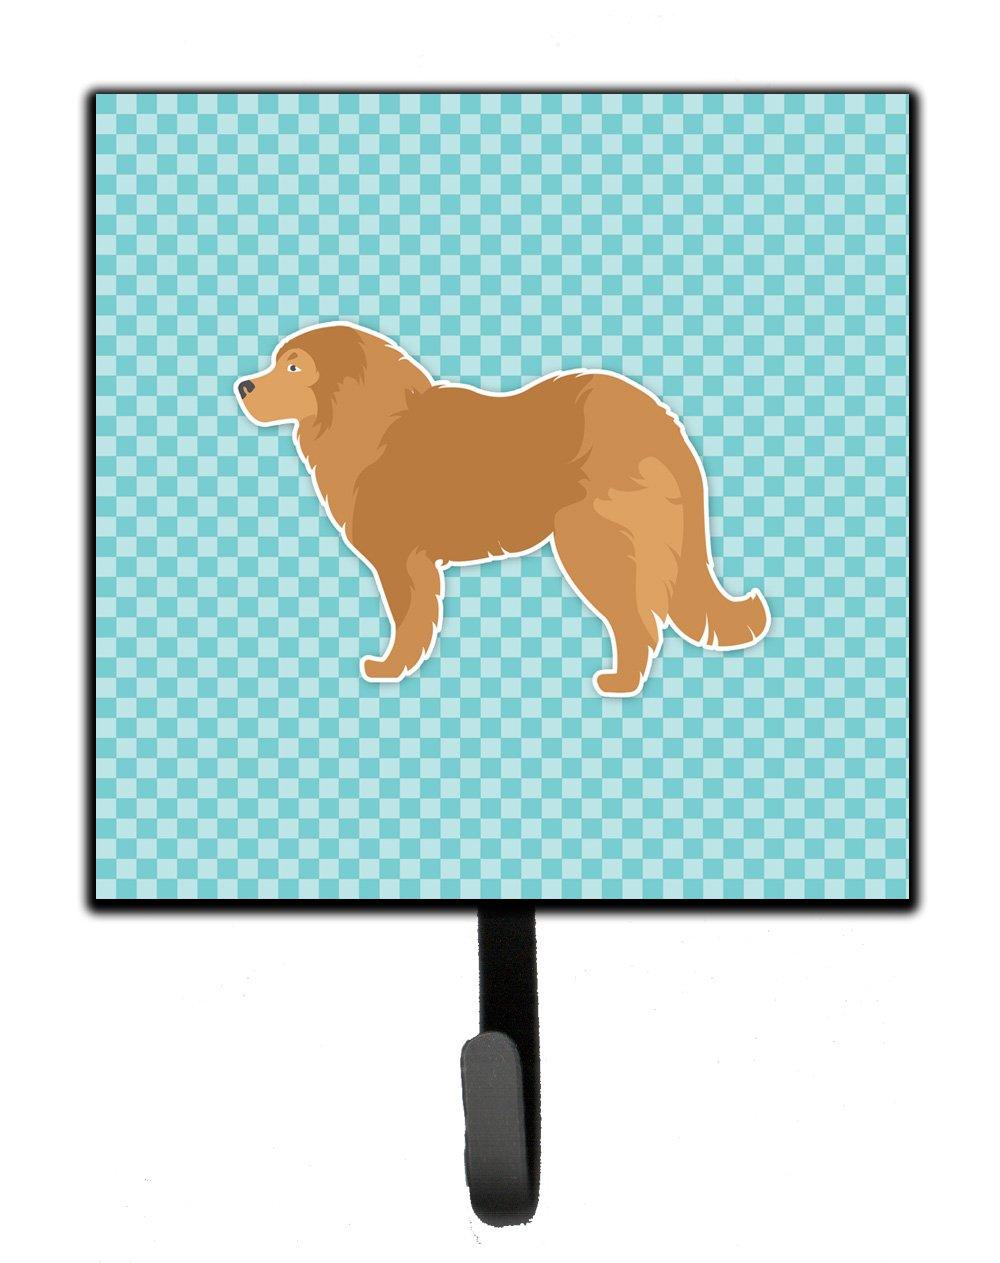 Carolines Treasures Caucasian Shepherd Dog Checkerboard Blue Leash or Key Holder BB3725SH4 Small Multicolor